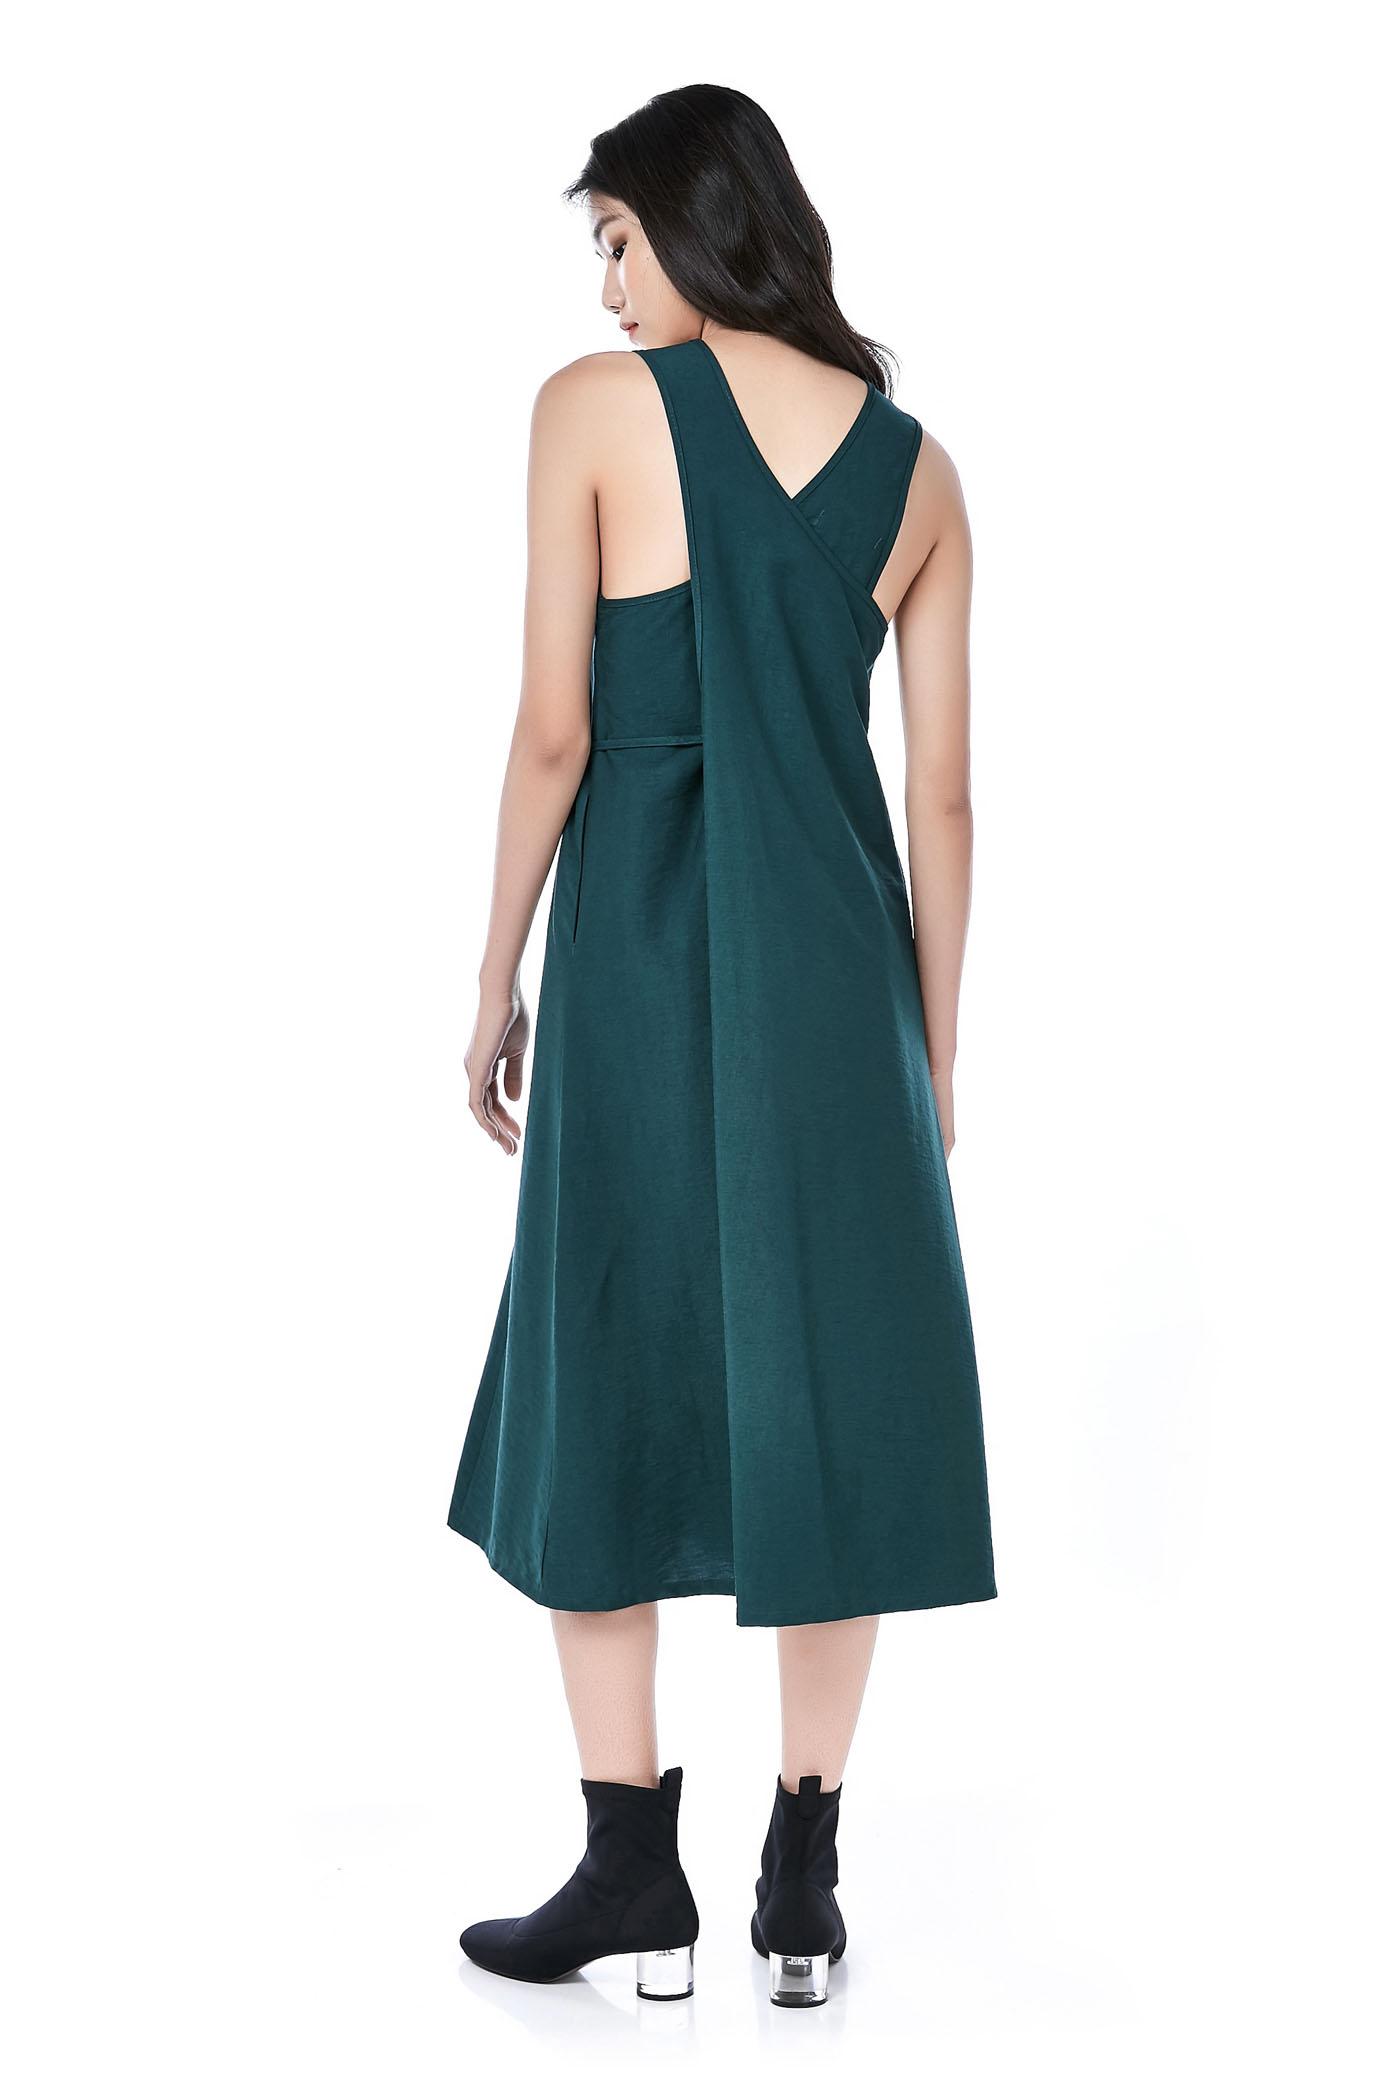 437c4af492f Laelia Cross-Back Midi Dress